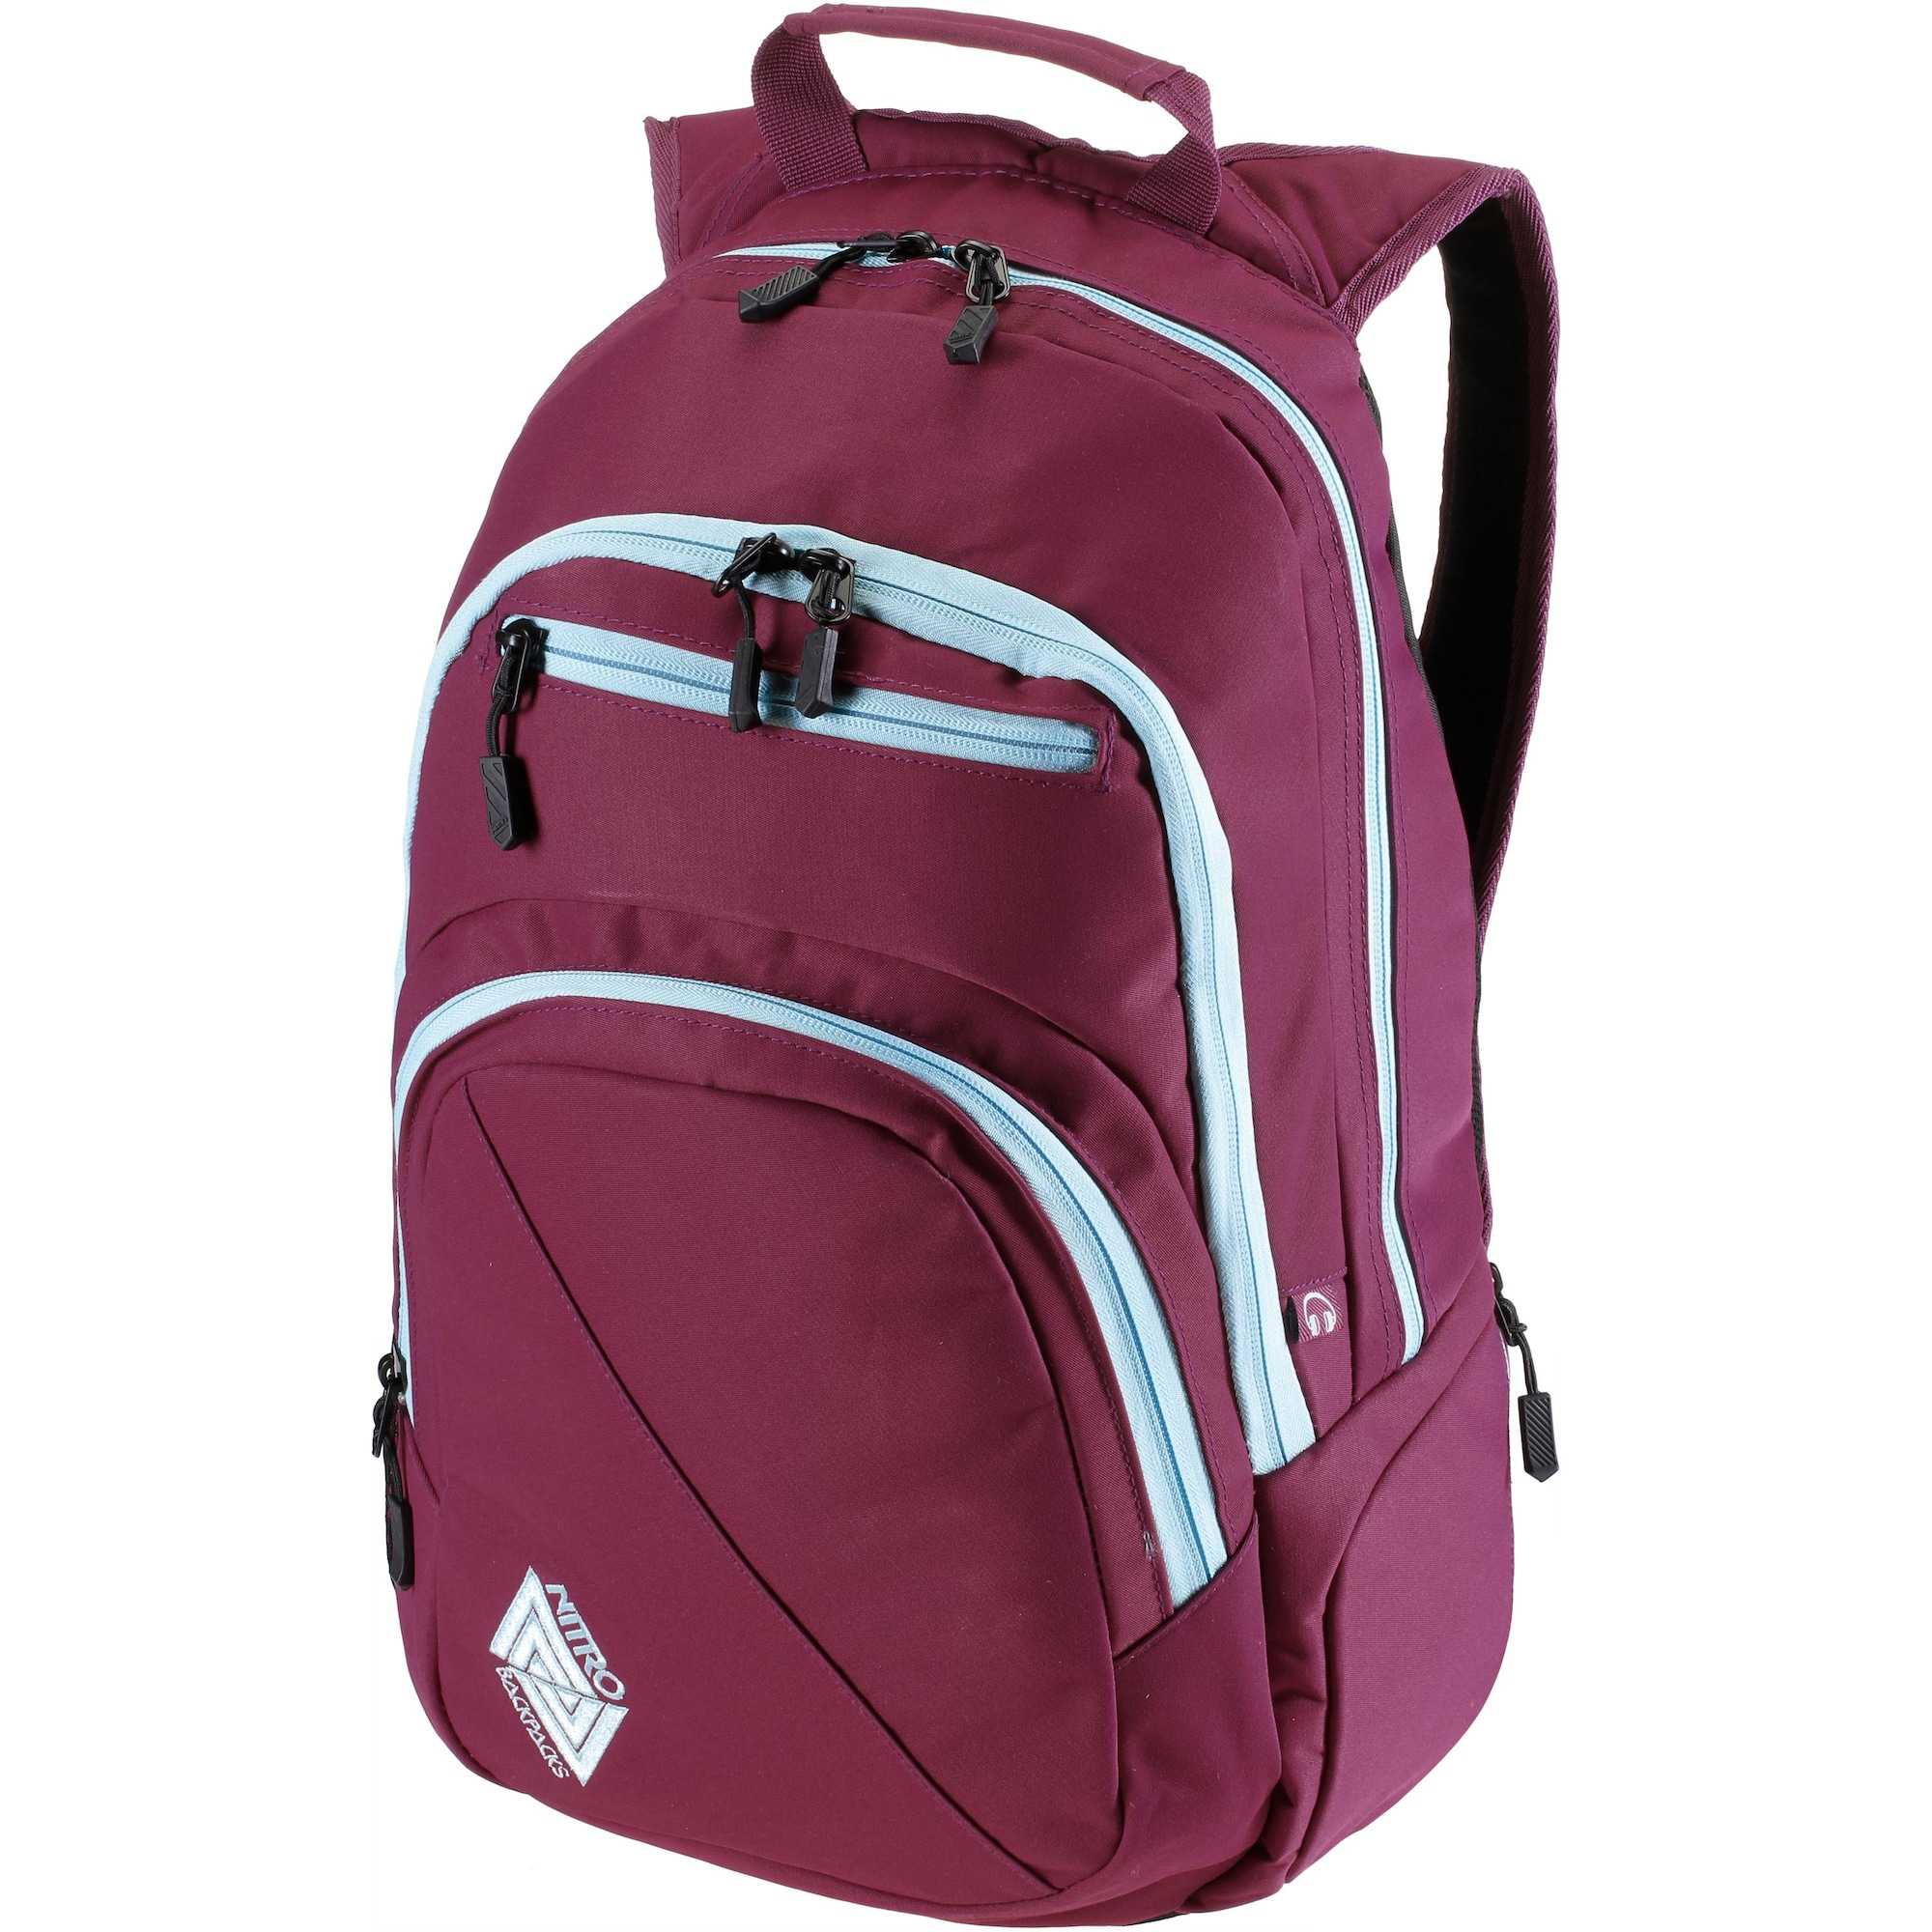 Daypack | Taschen > Rucksäcke > Tourenrucksäcke | Hellblau - Pink | Nitro